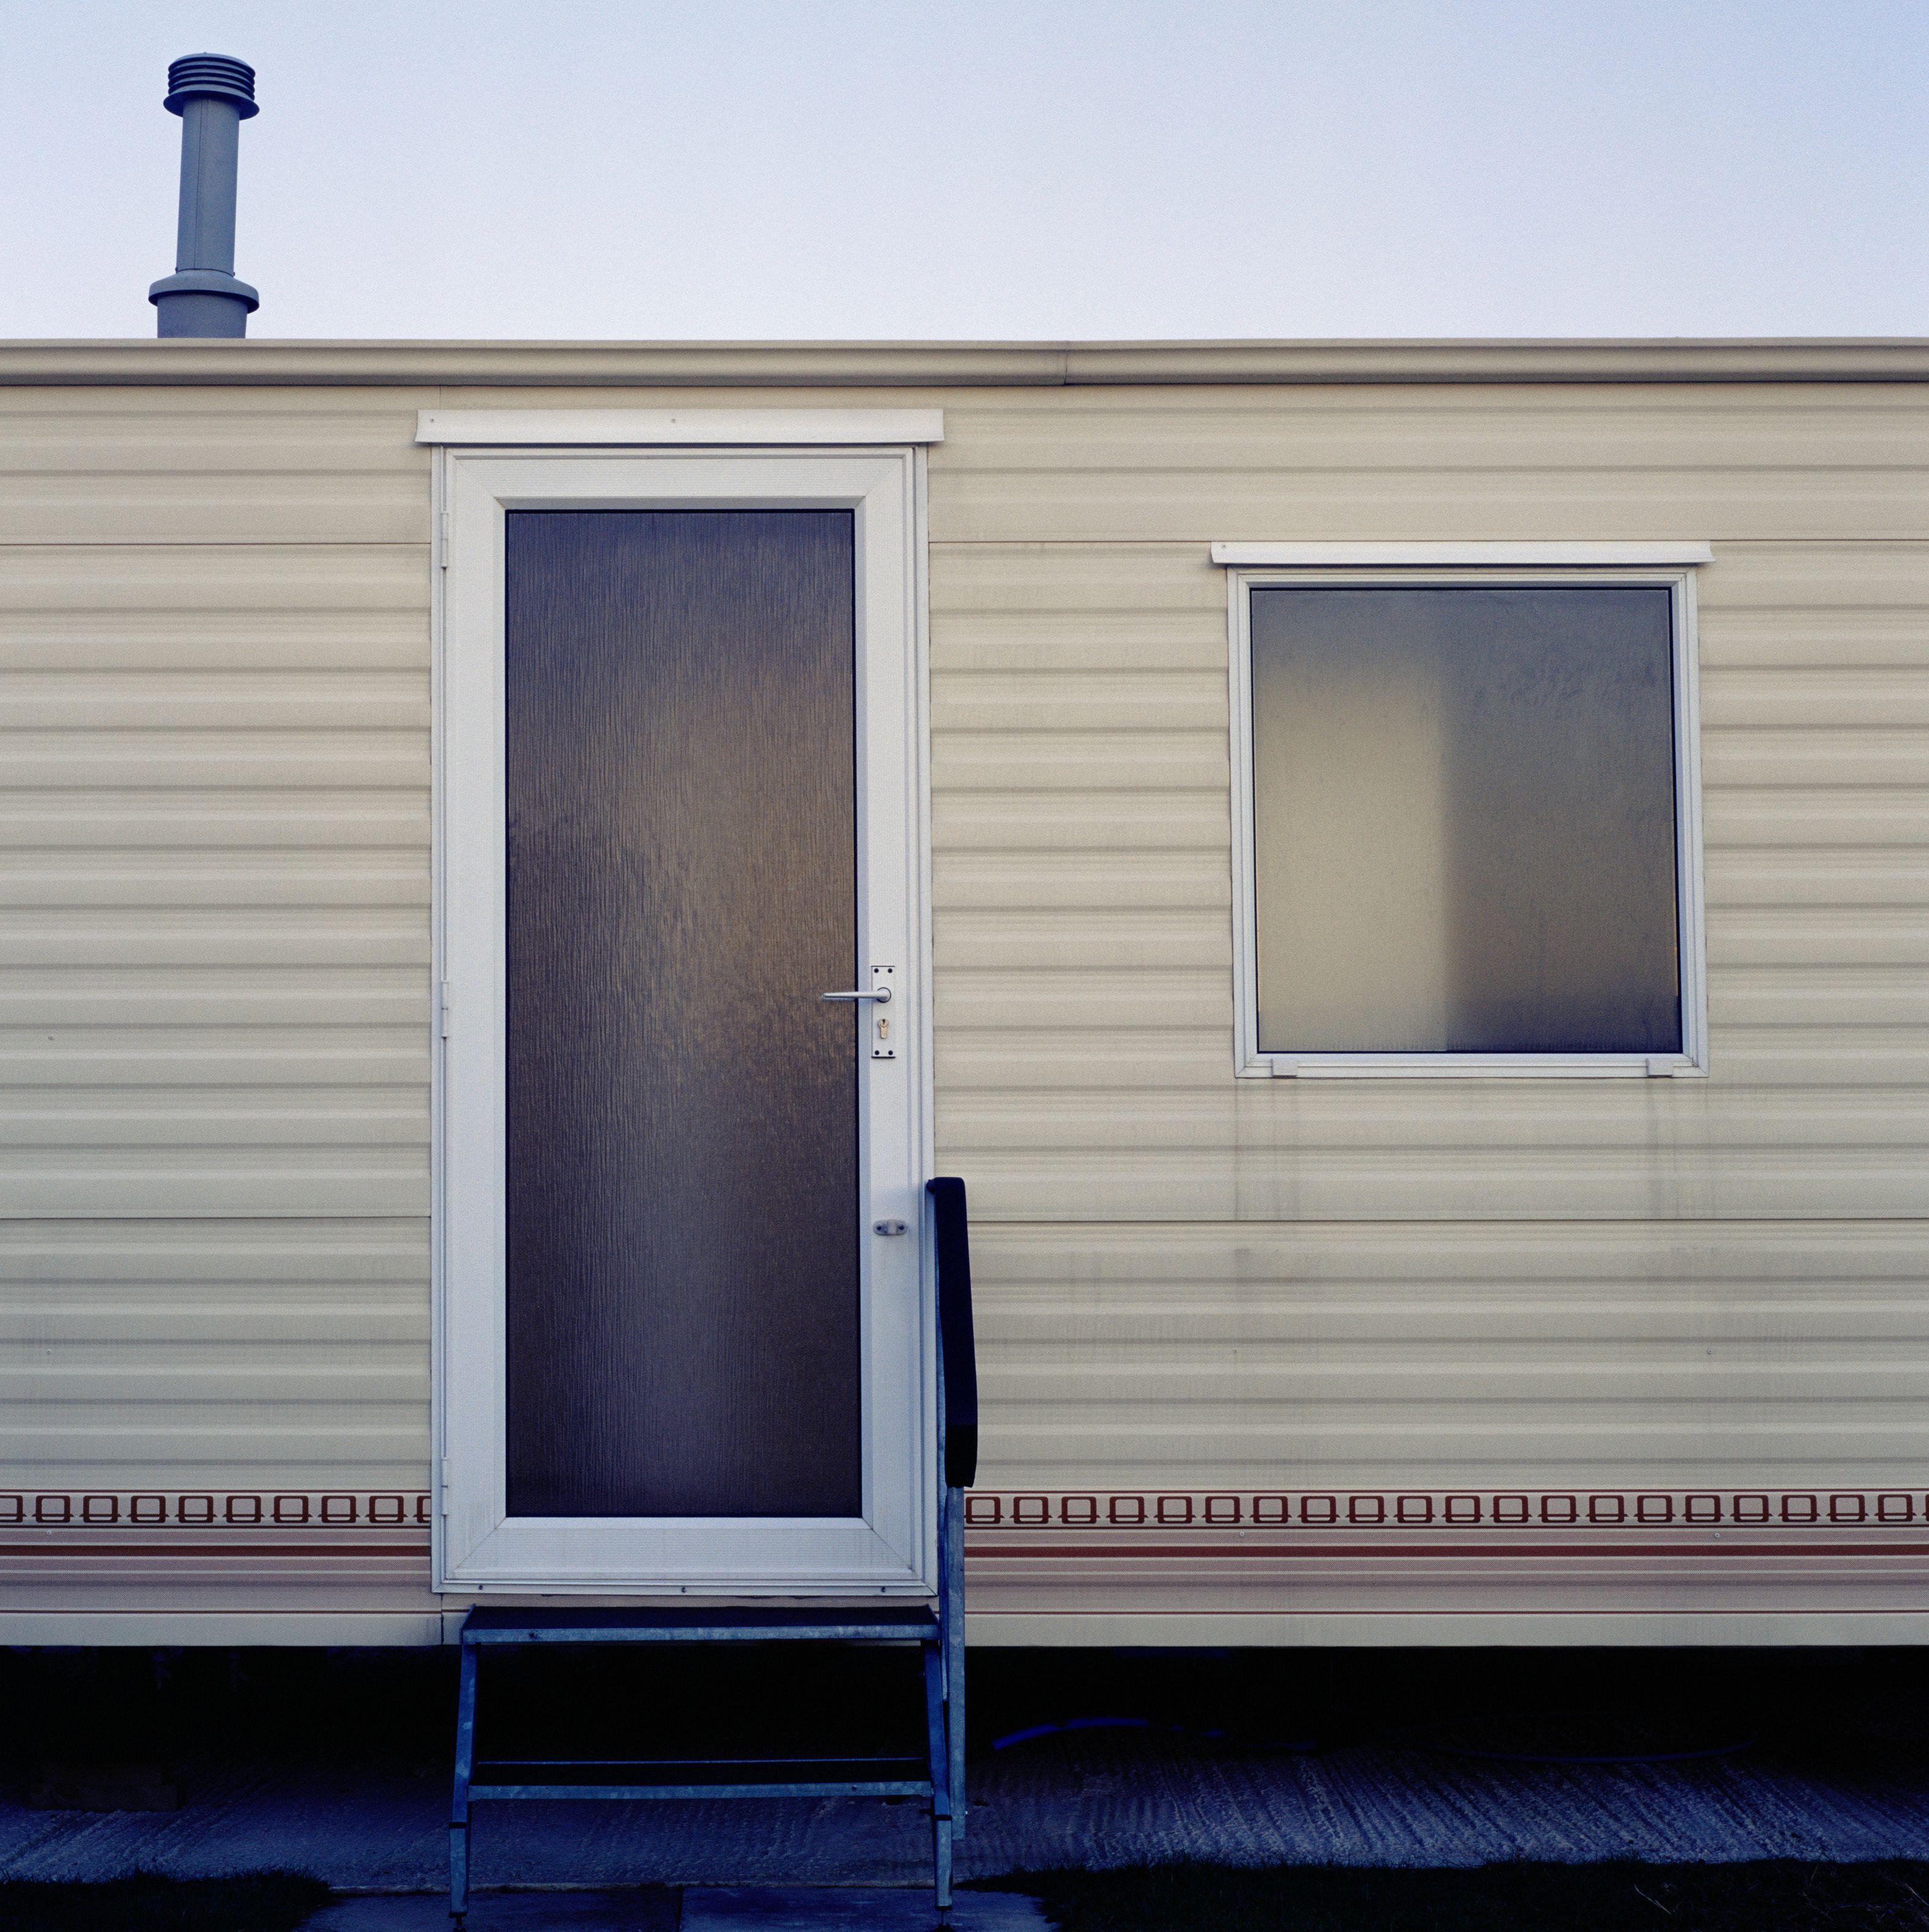 Vinyl Siding Repair Tape - How to repair a polybutylene pipe exterior house painting